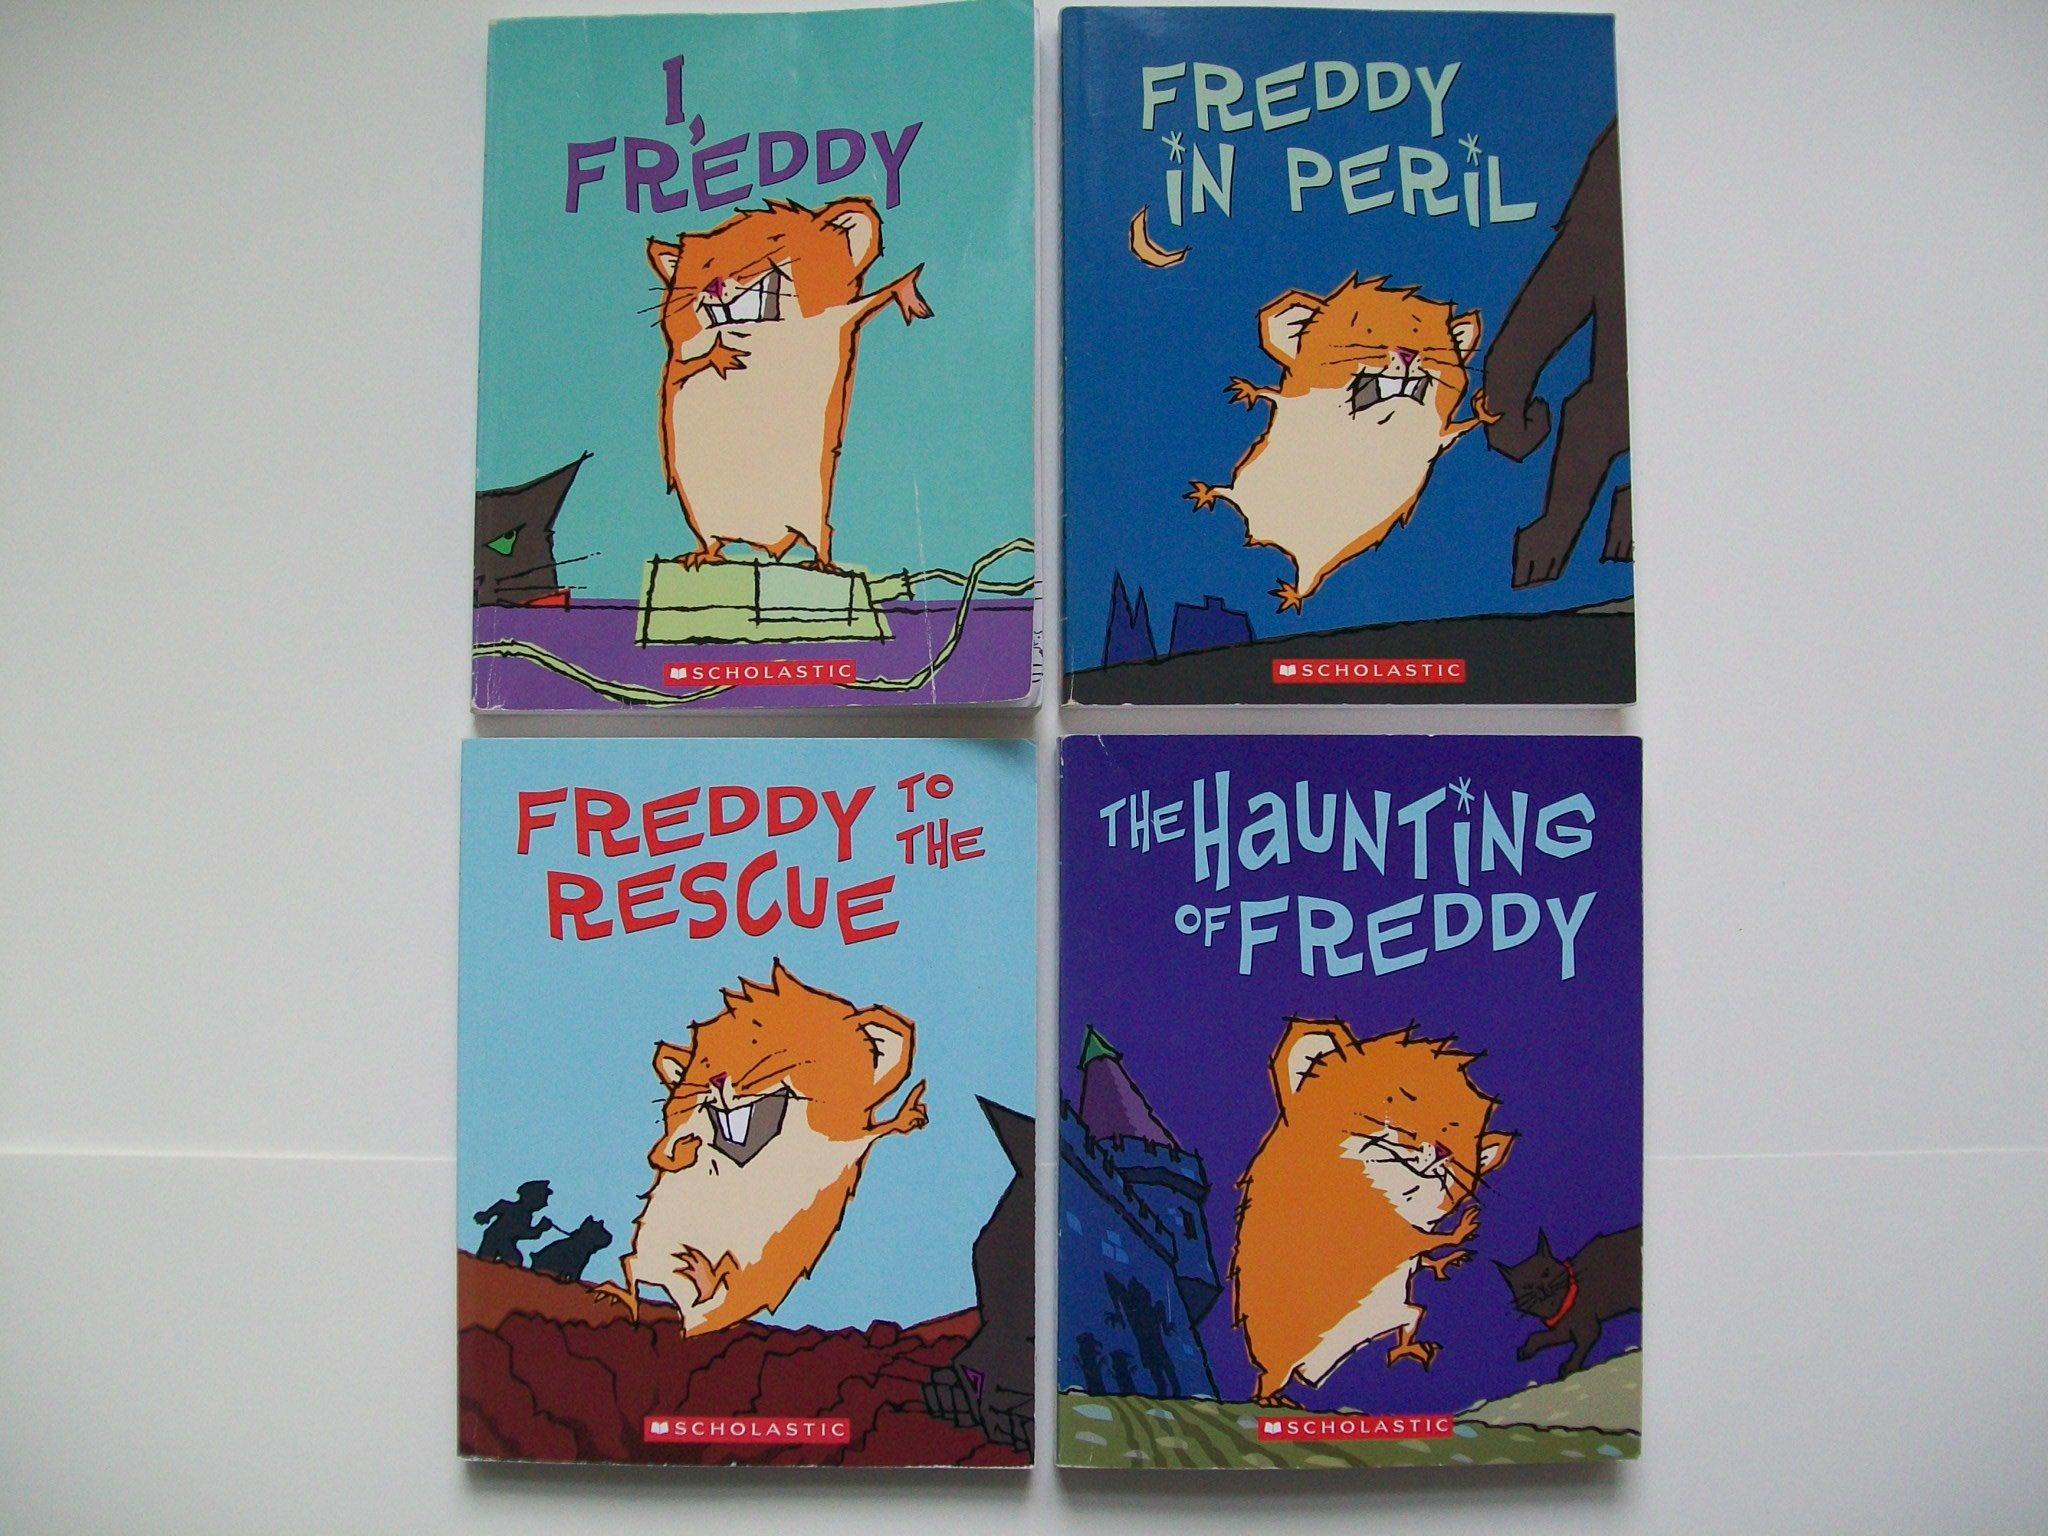 Golden Hamster Saga (Set of 4) I, Freddy; Freddy in Peril; Freddy to the  Rescue; Haunting of Freddy: Dietlof Reiche, John Brownjohn: Amazon.com:  Books